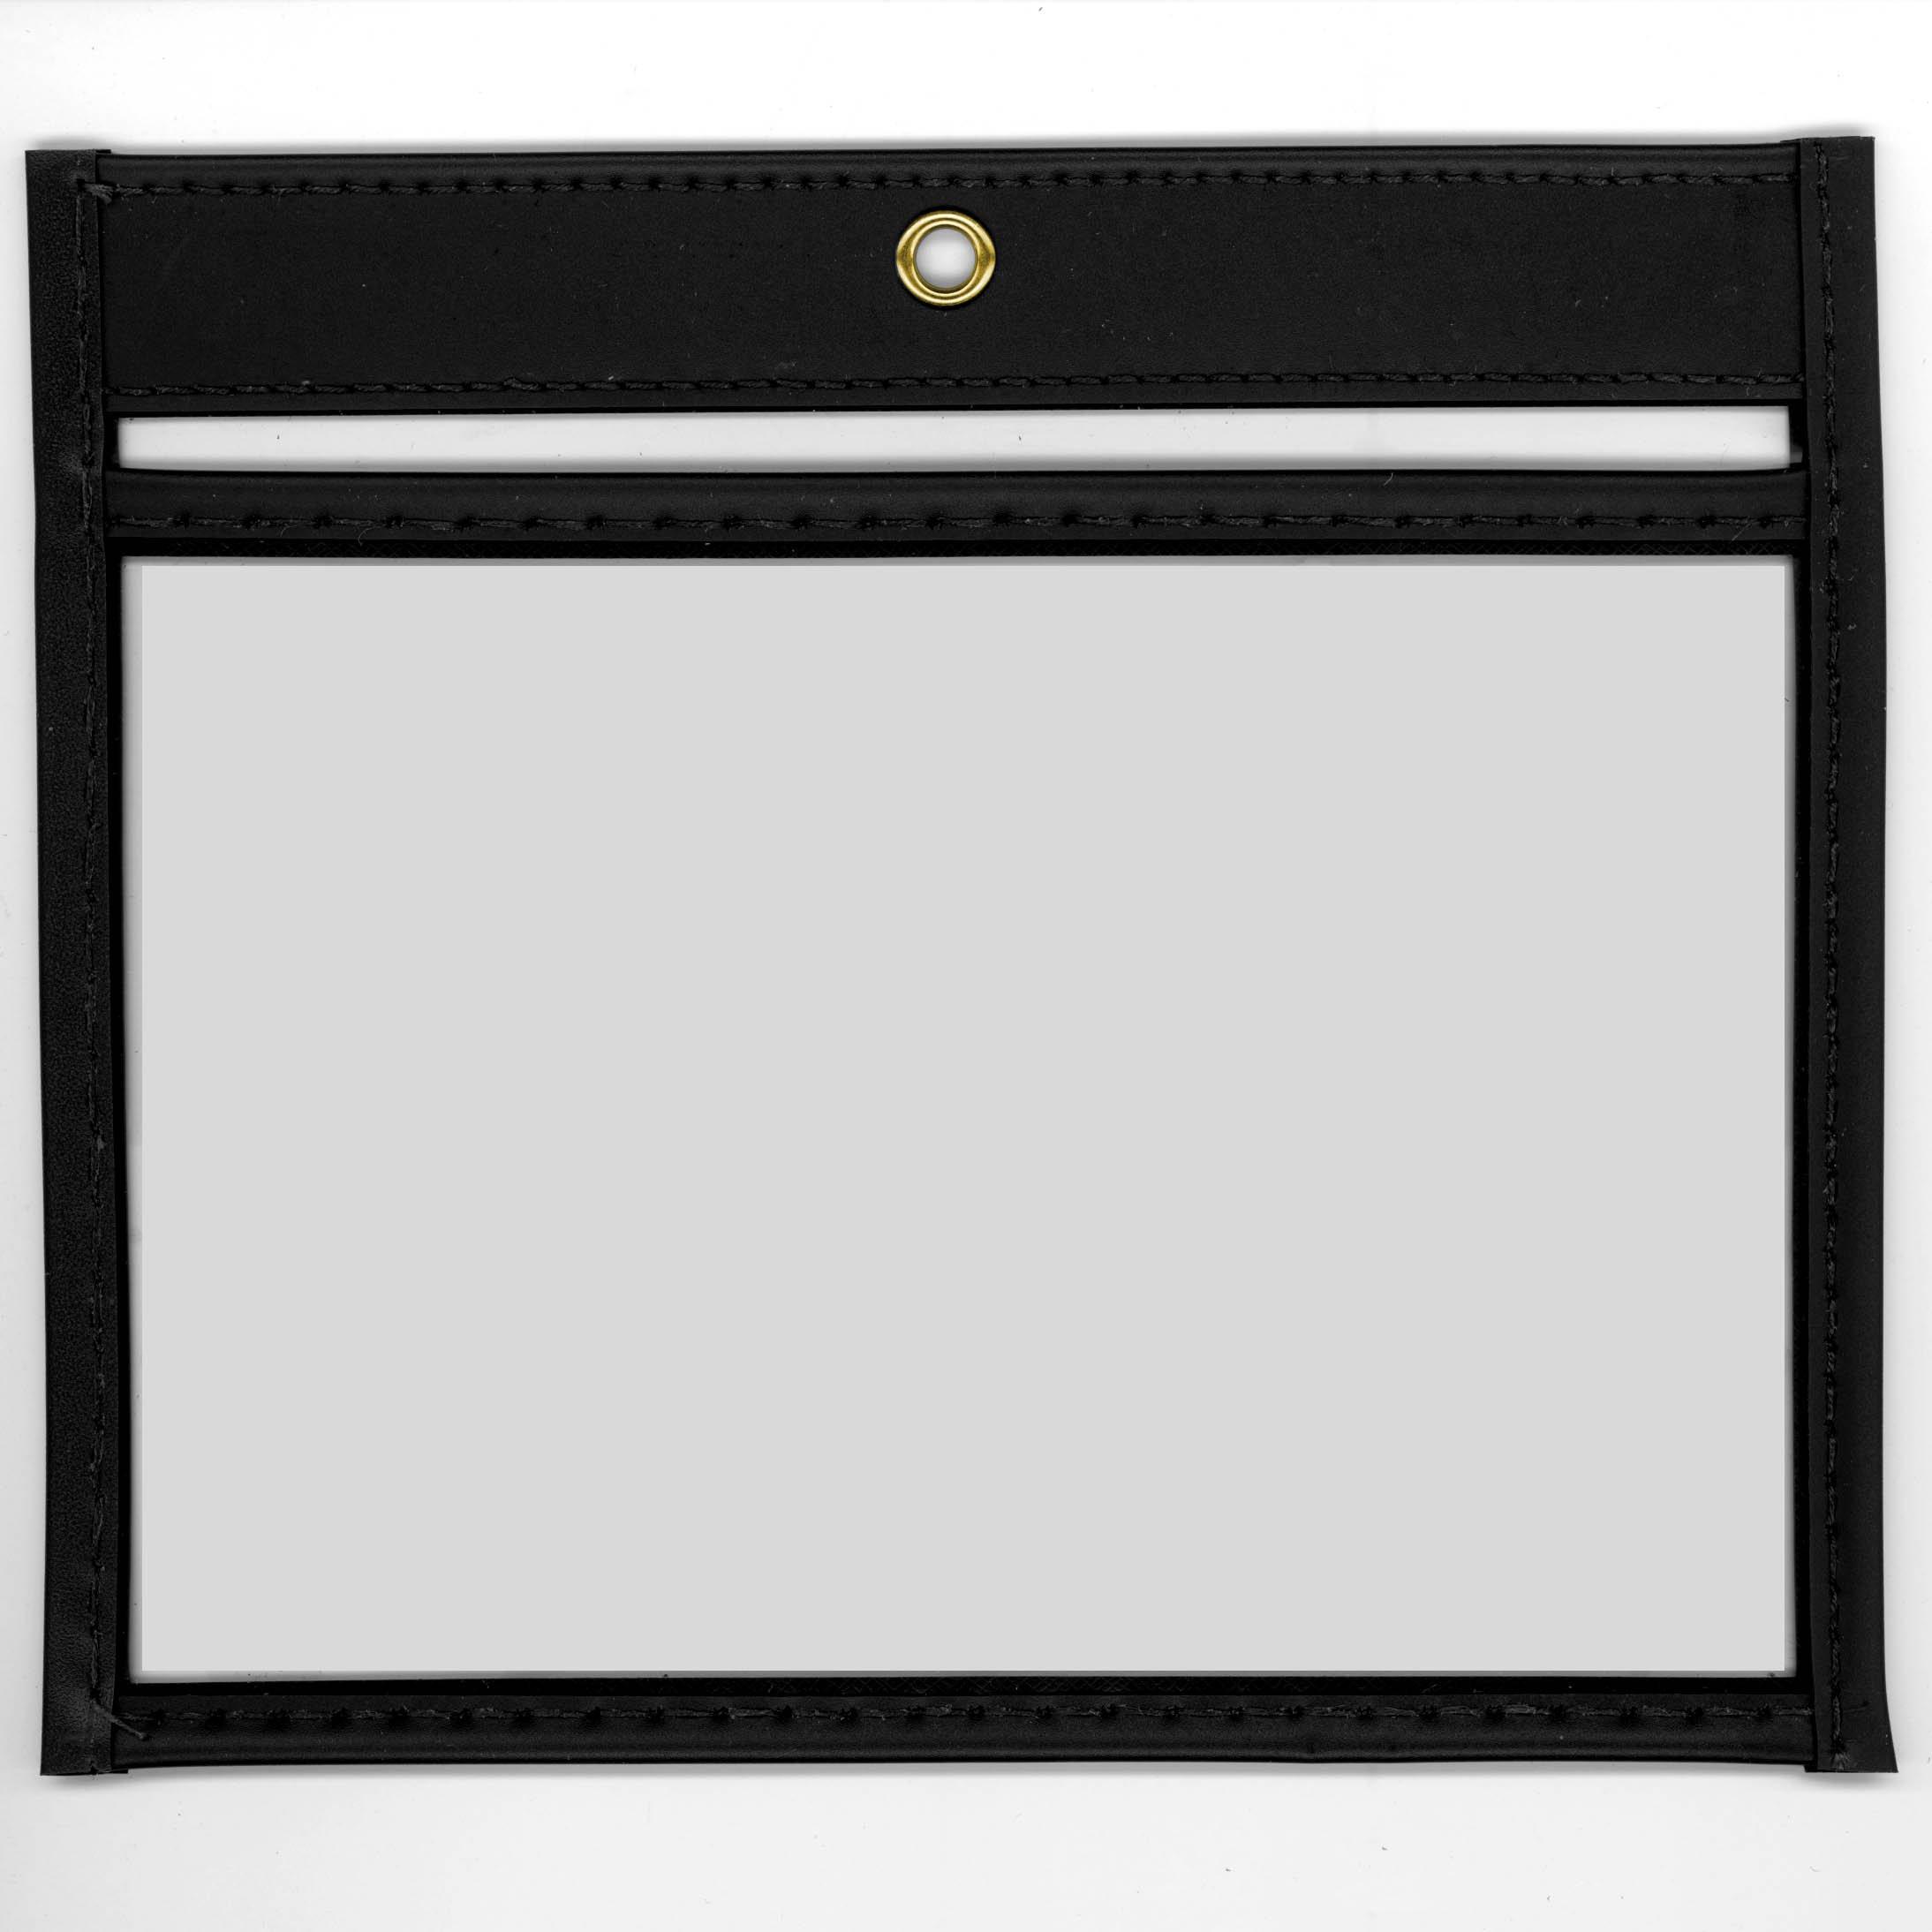 StoreSMART - 6'' x 4'' - Open Long - Black Rigid Vinyl Sewn Pocket - 50-Pack - Photo Size - T85201L-BK-50